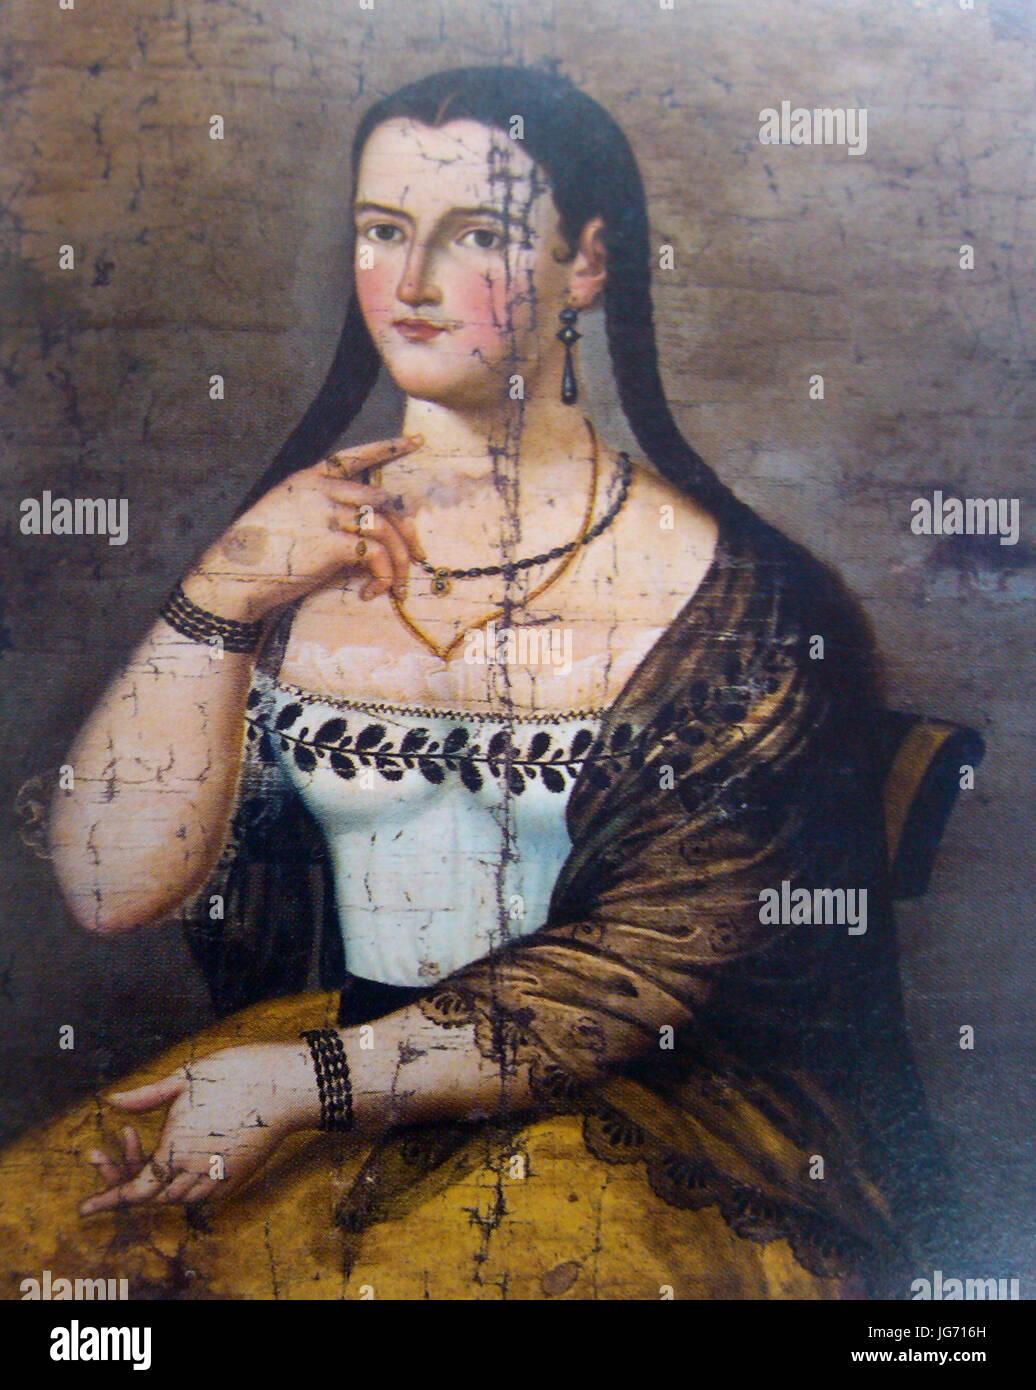 Manuela CaơB1izares (adolescente) 02 Photo Stock